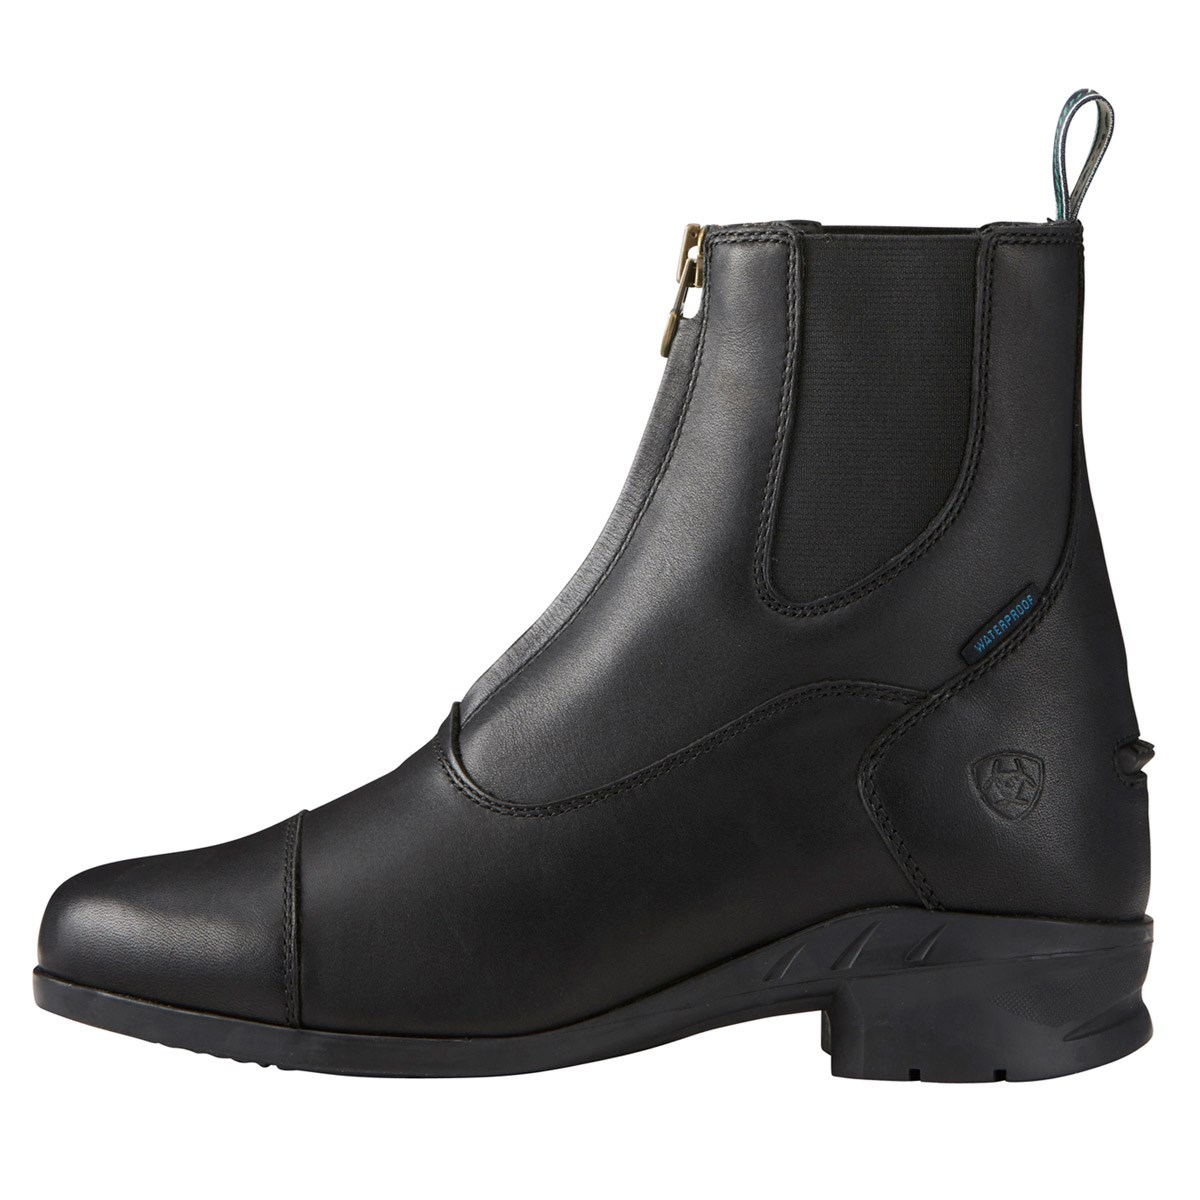 e01264aae160 Ariat Heritage IV Zip H2O Womens Paddock Boot - Black - Redpost ...